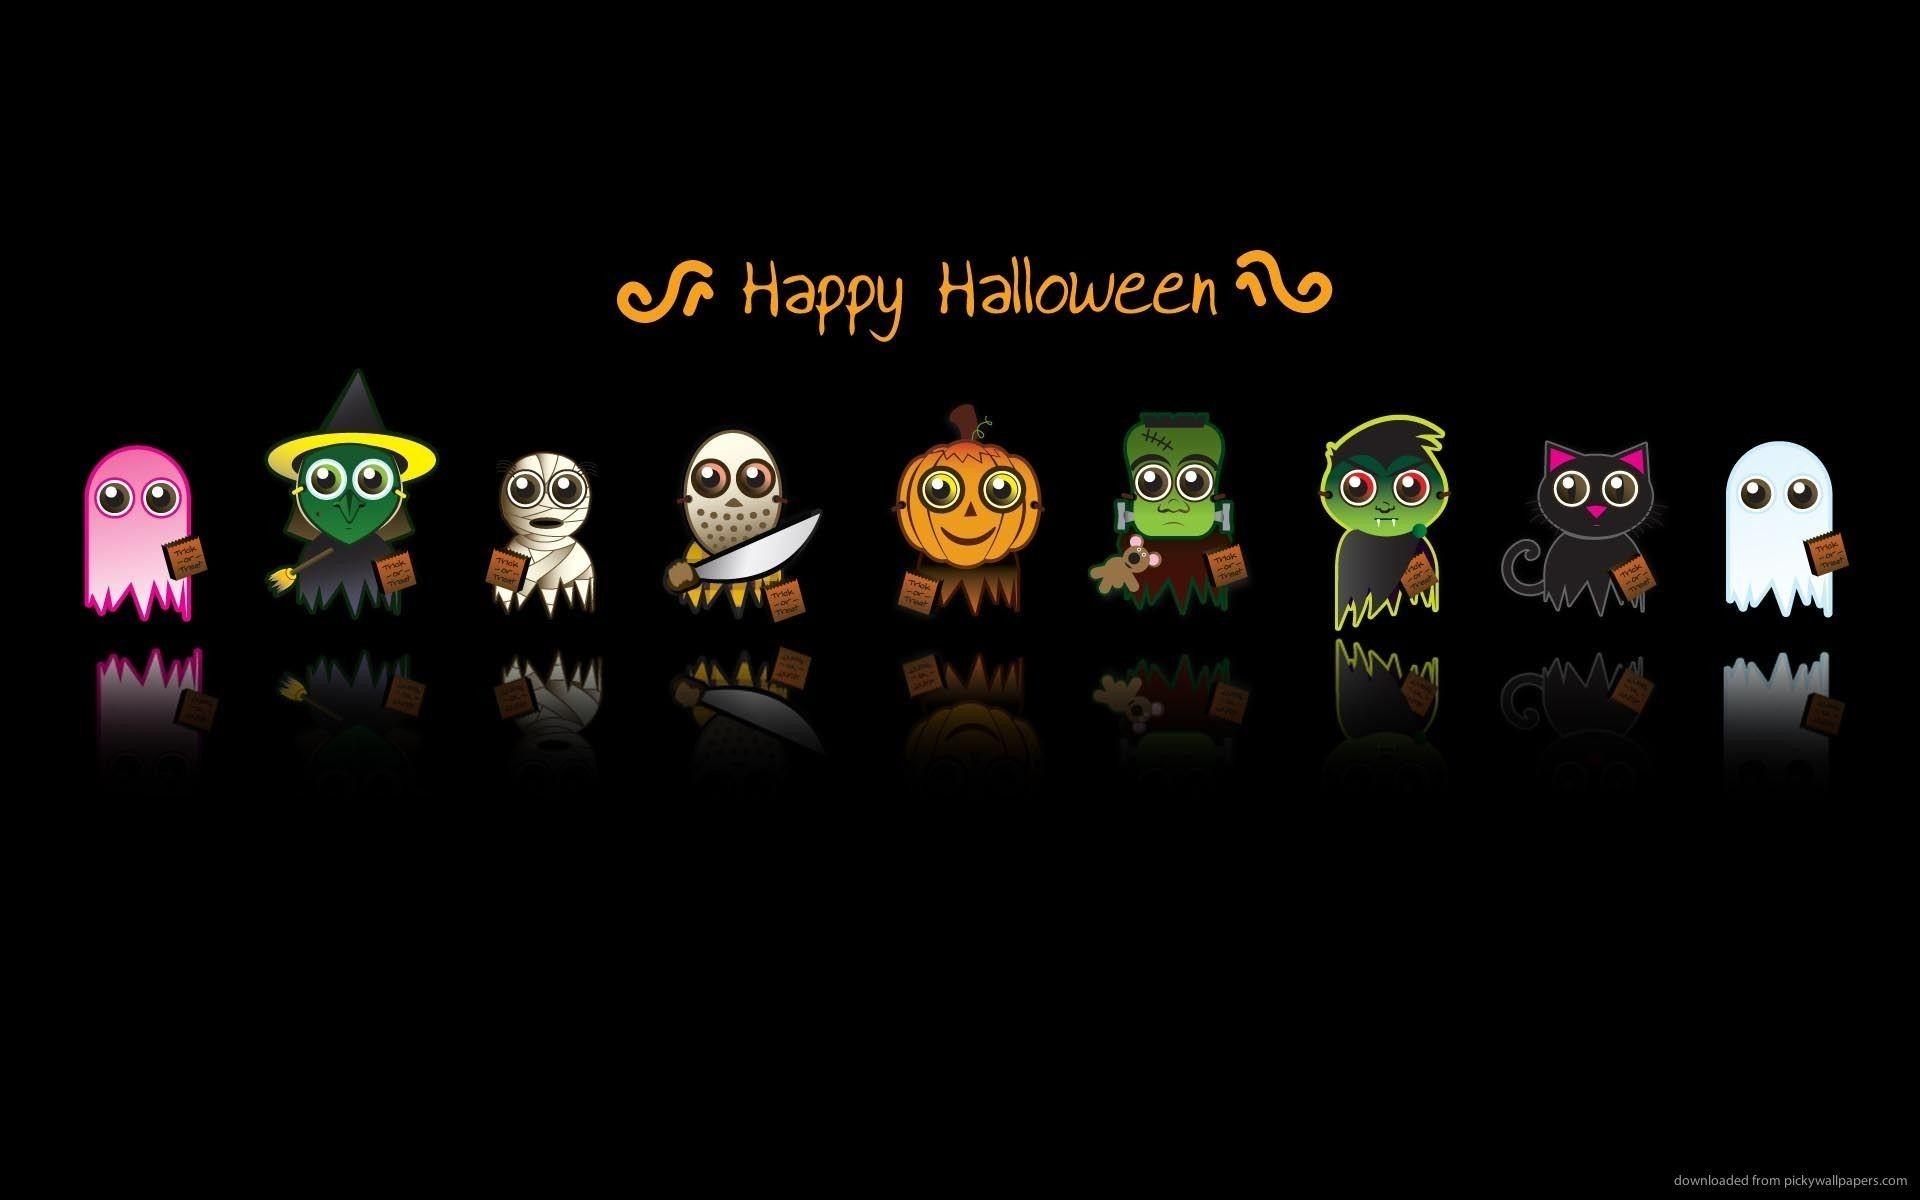 Popular Wallpaper High Quality Halloween - 1156024-top-cute-halloween-wallpaper-for-desktop-1920x1200-for-xiaomi  Pic_549399.jpg